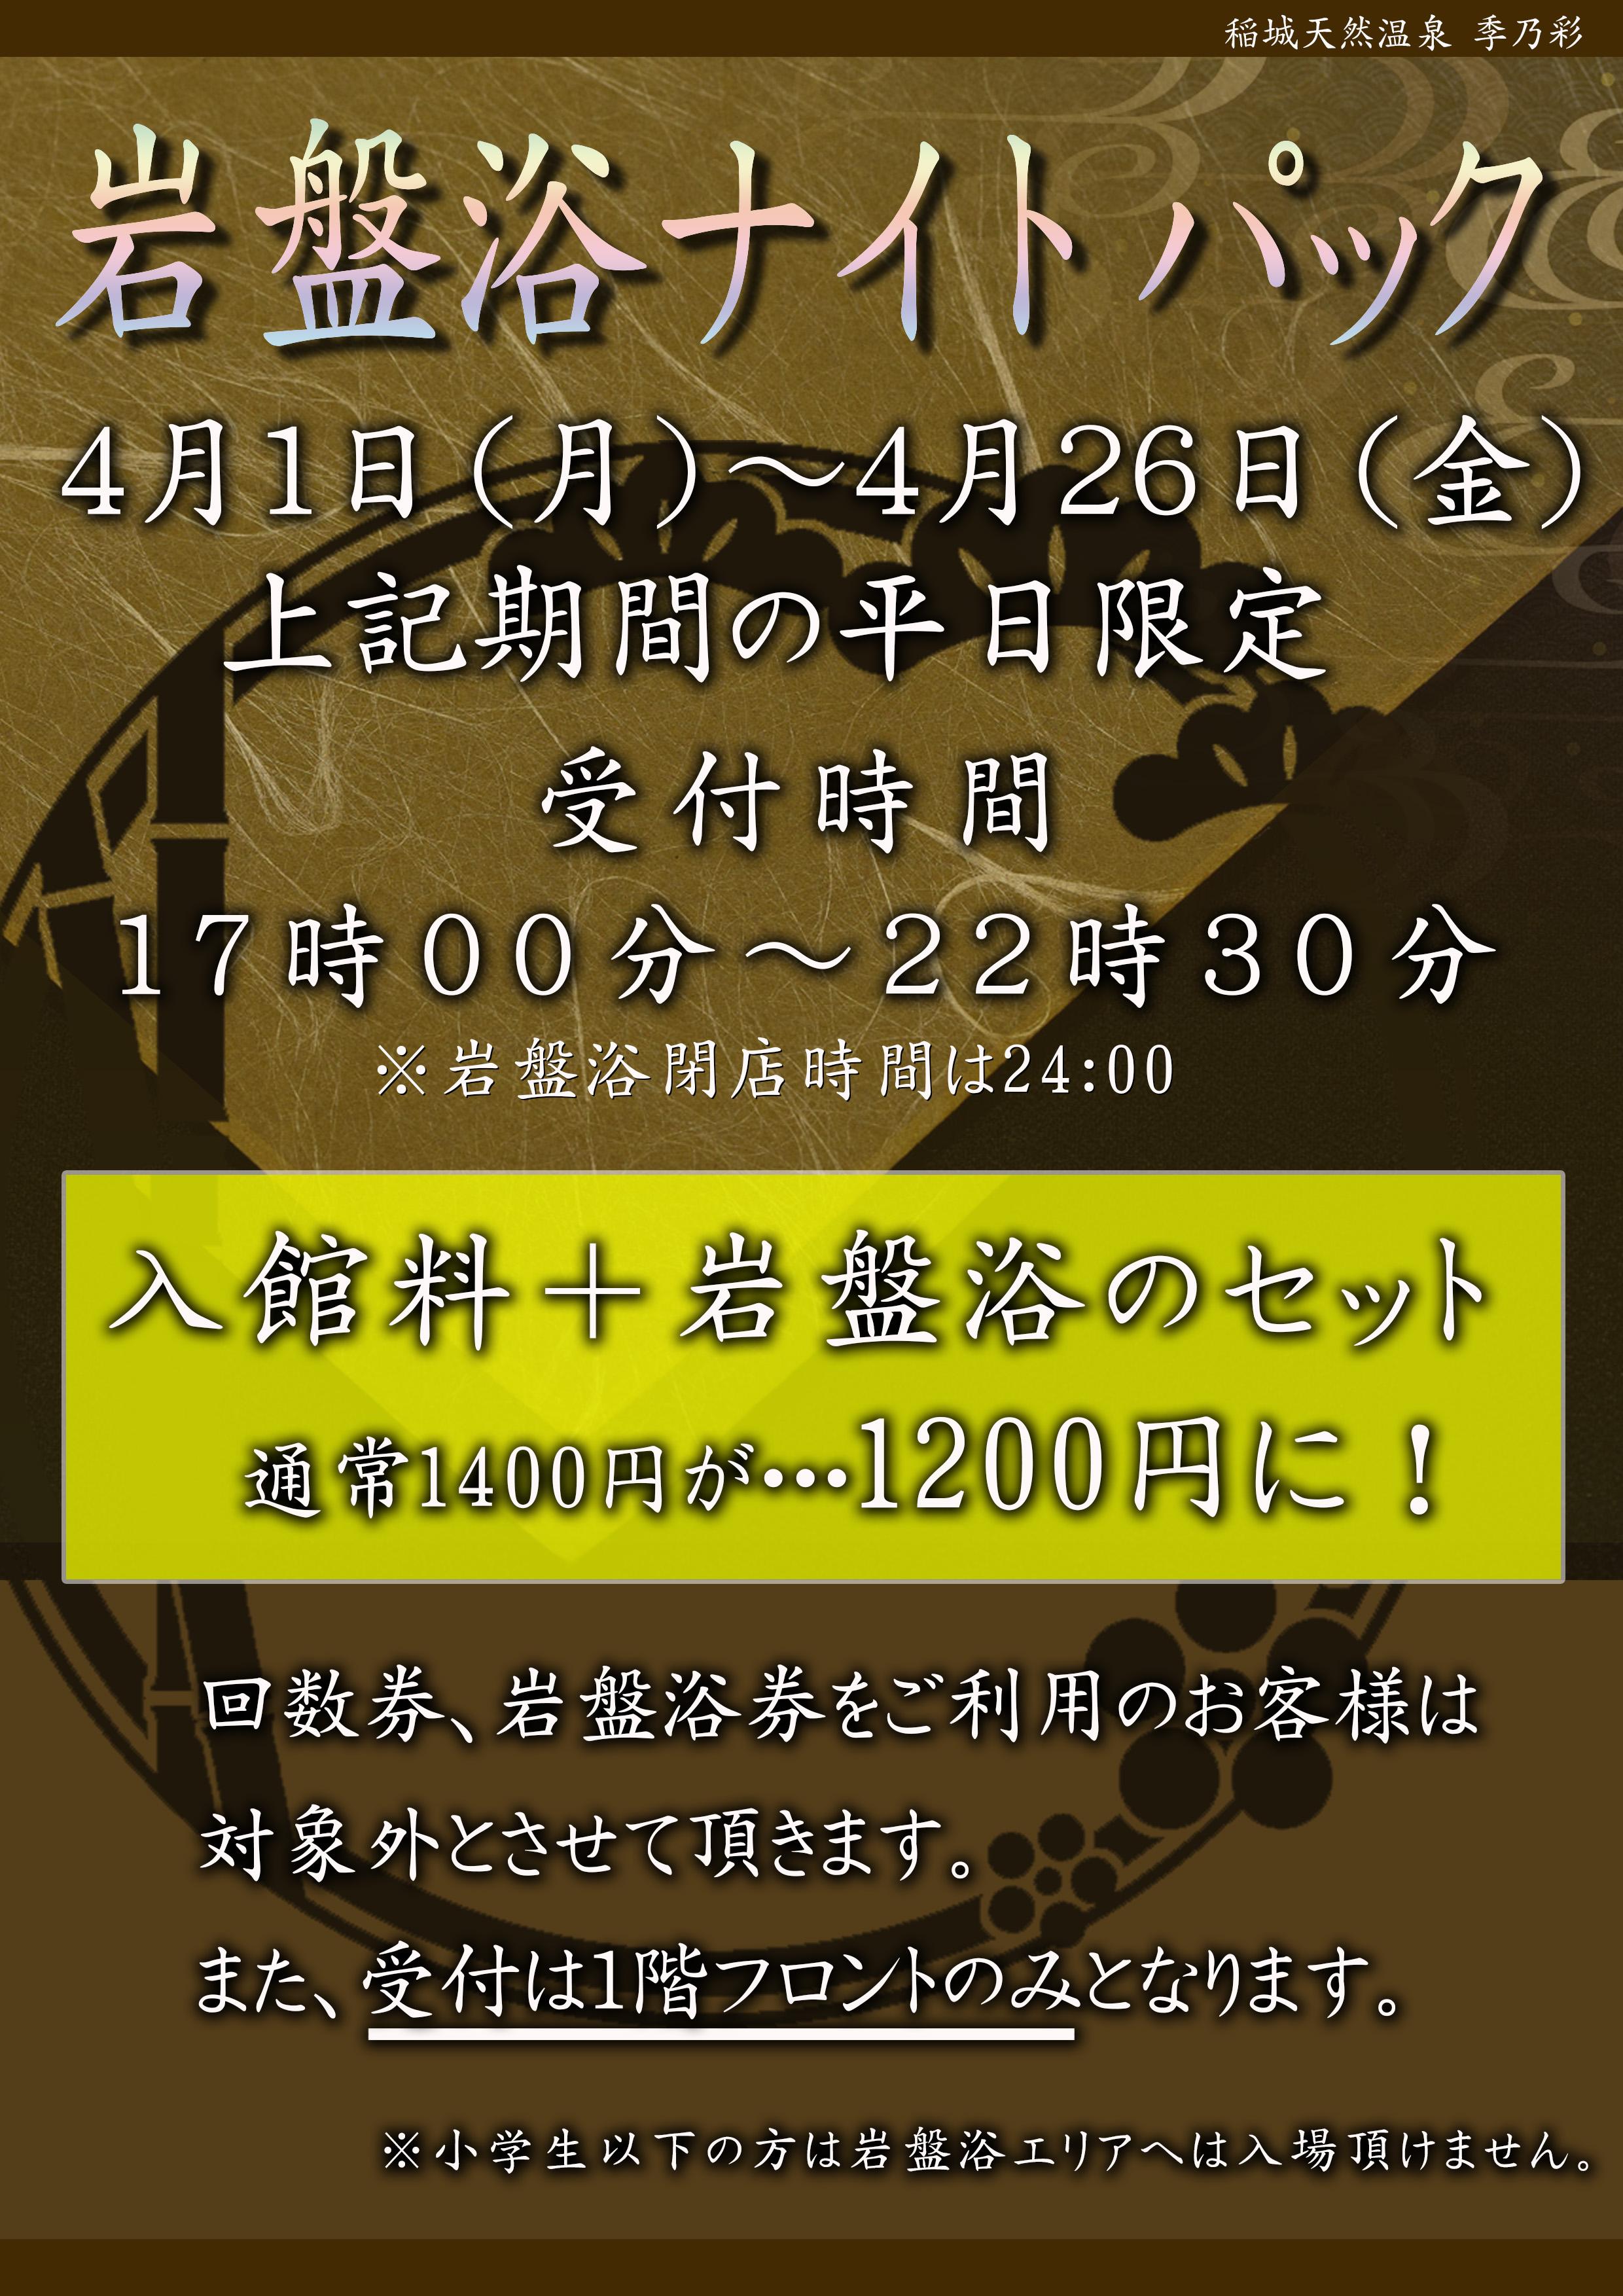 201904POP イベント 岩盤浴 ナイトパック 201804~